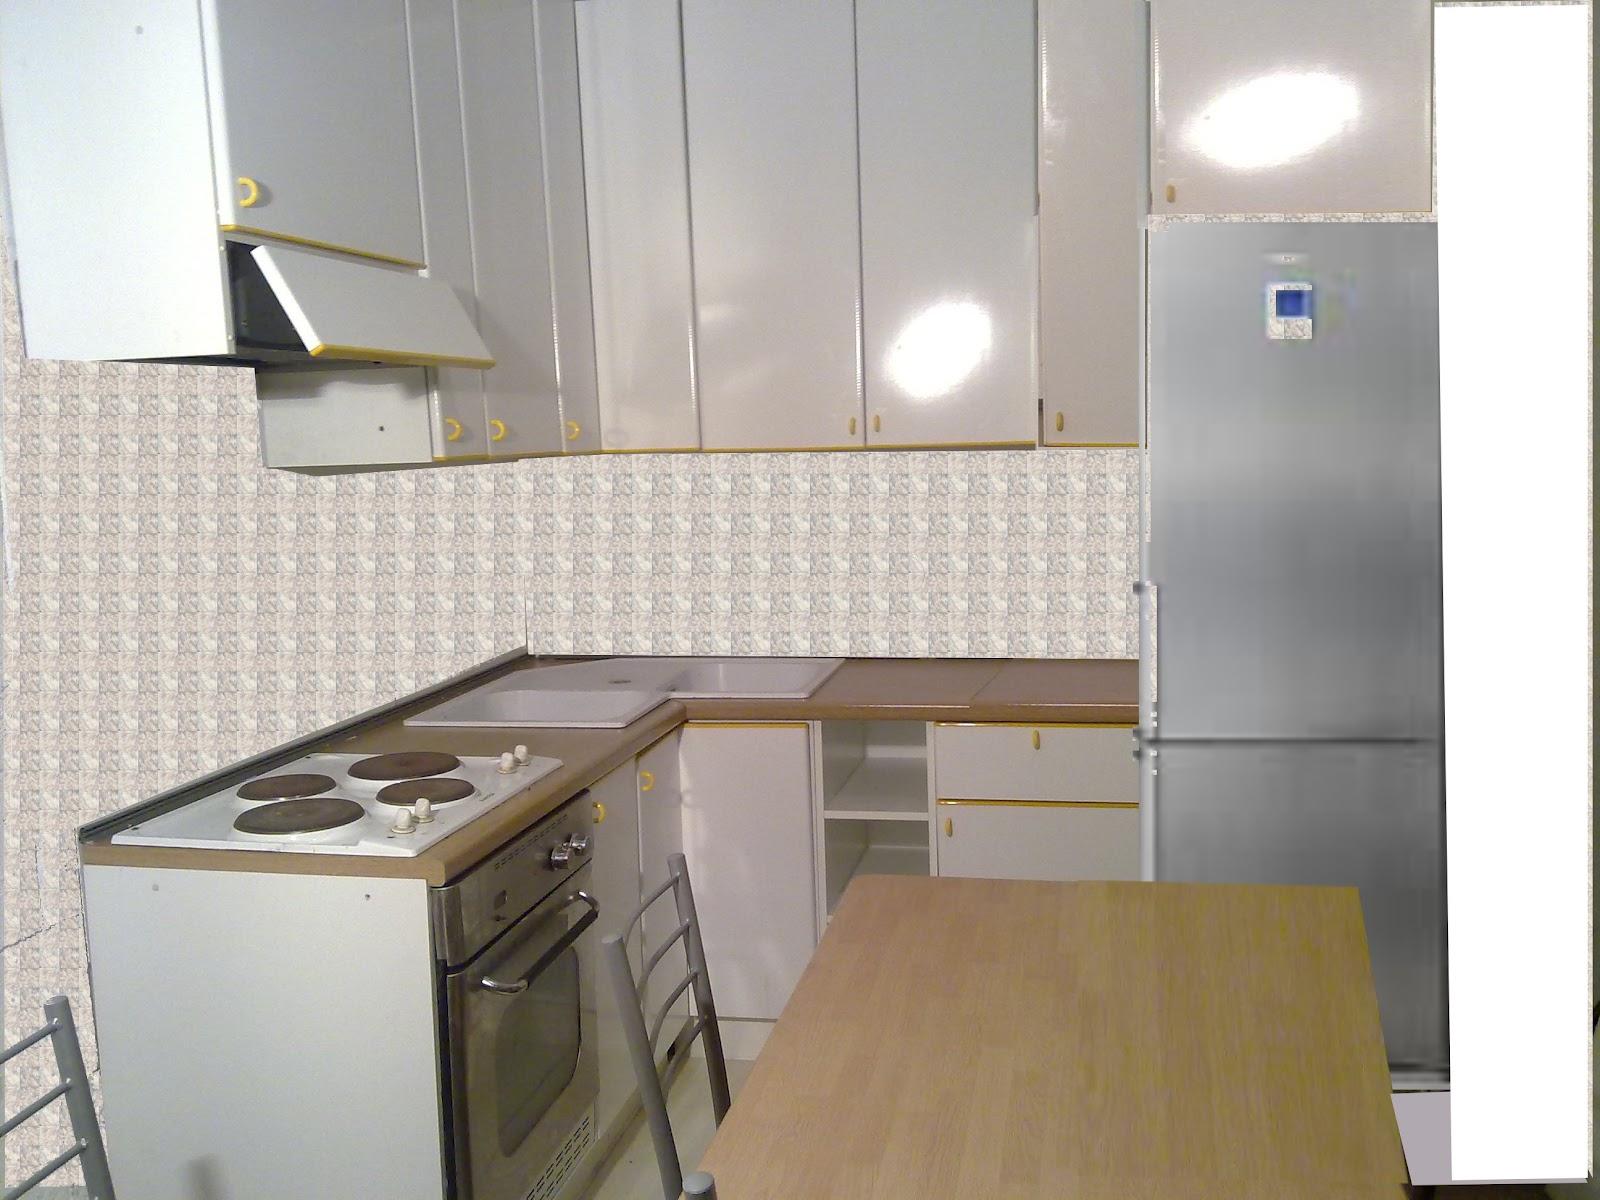 Arredamento usato a roma for Arredamento cucina roma